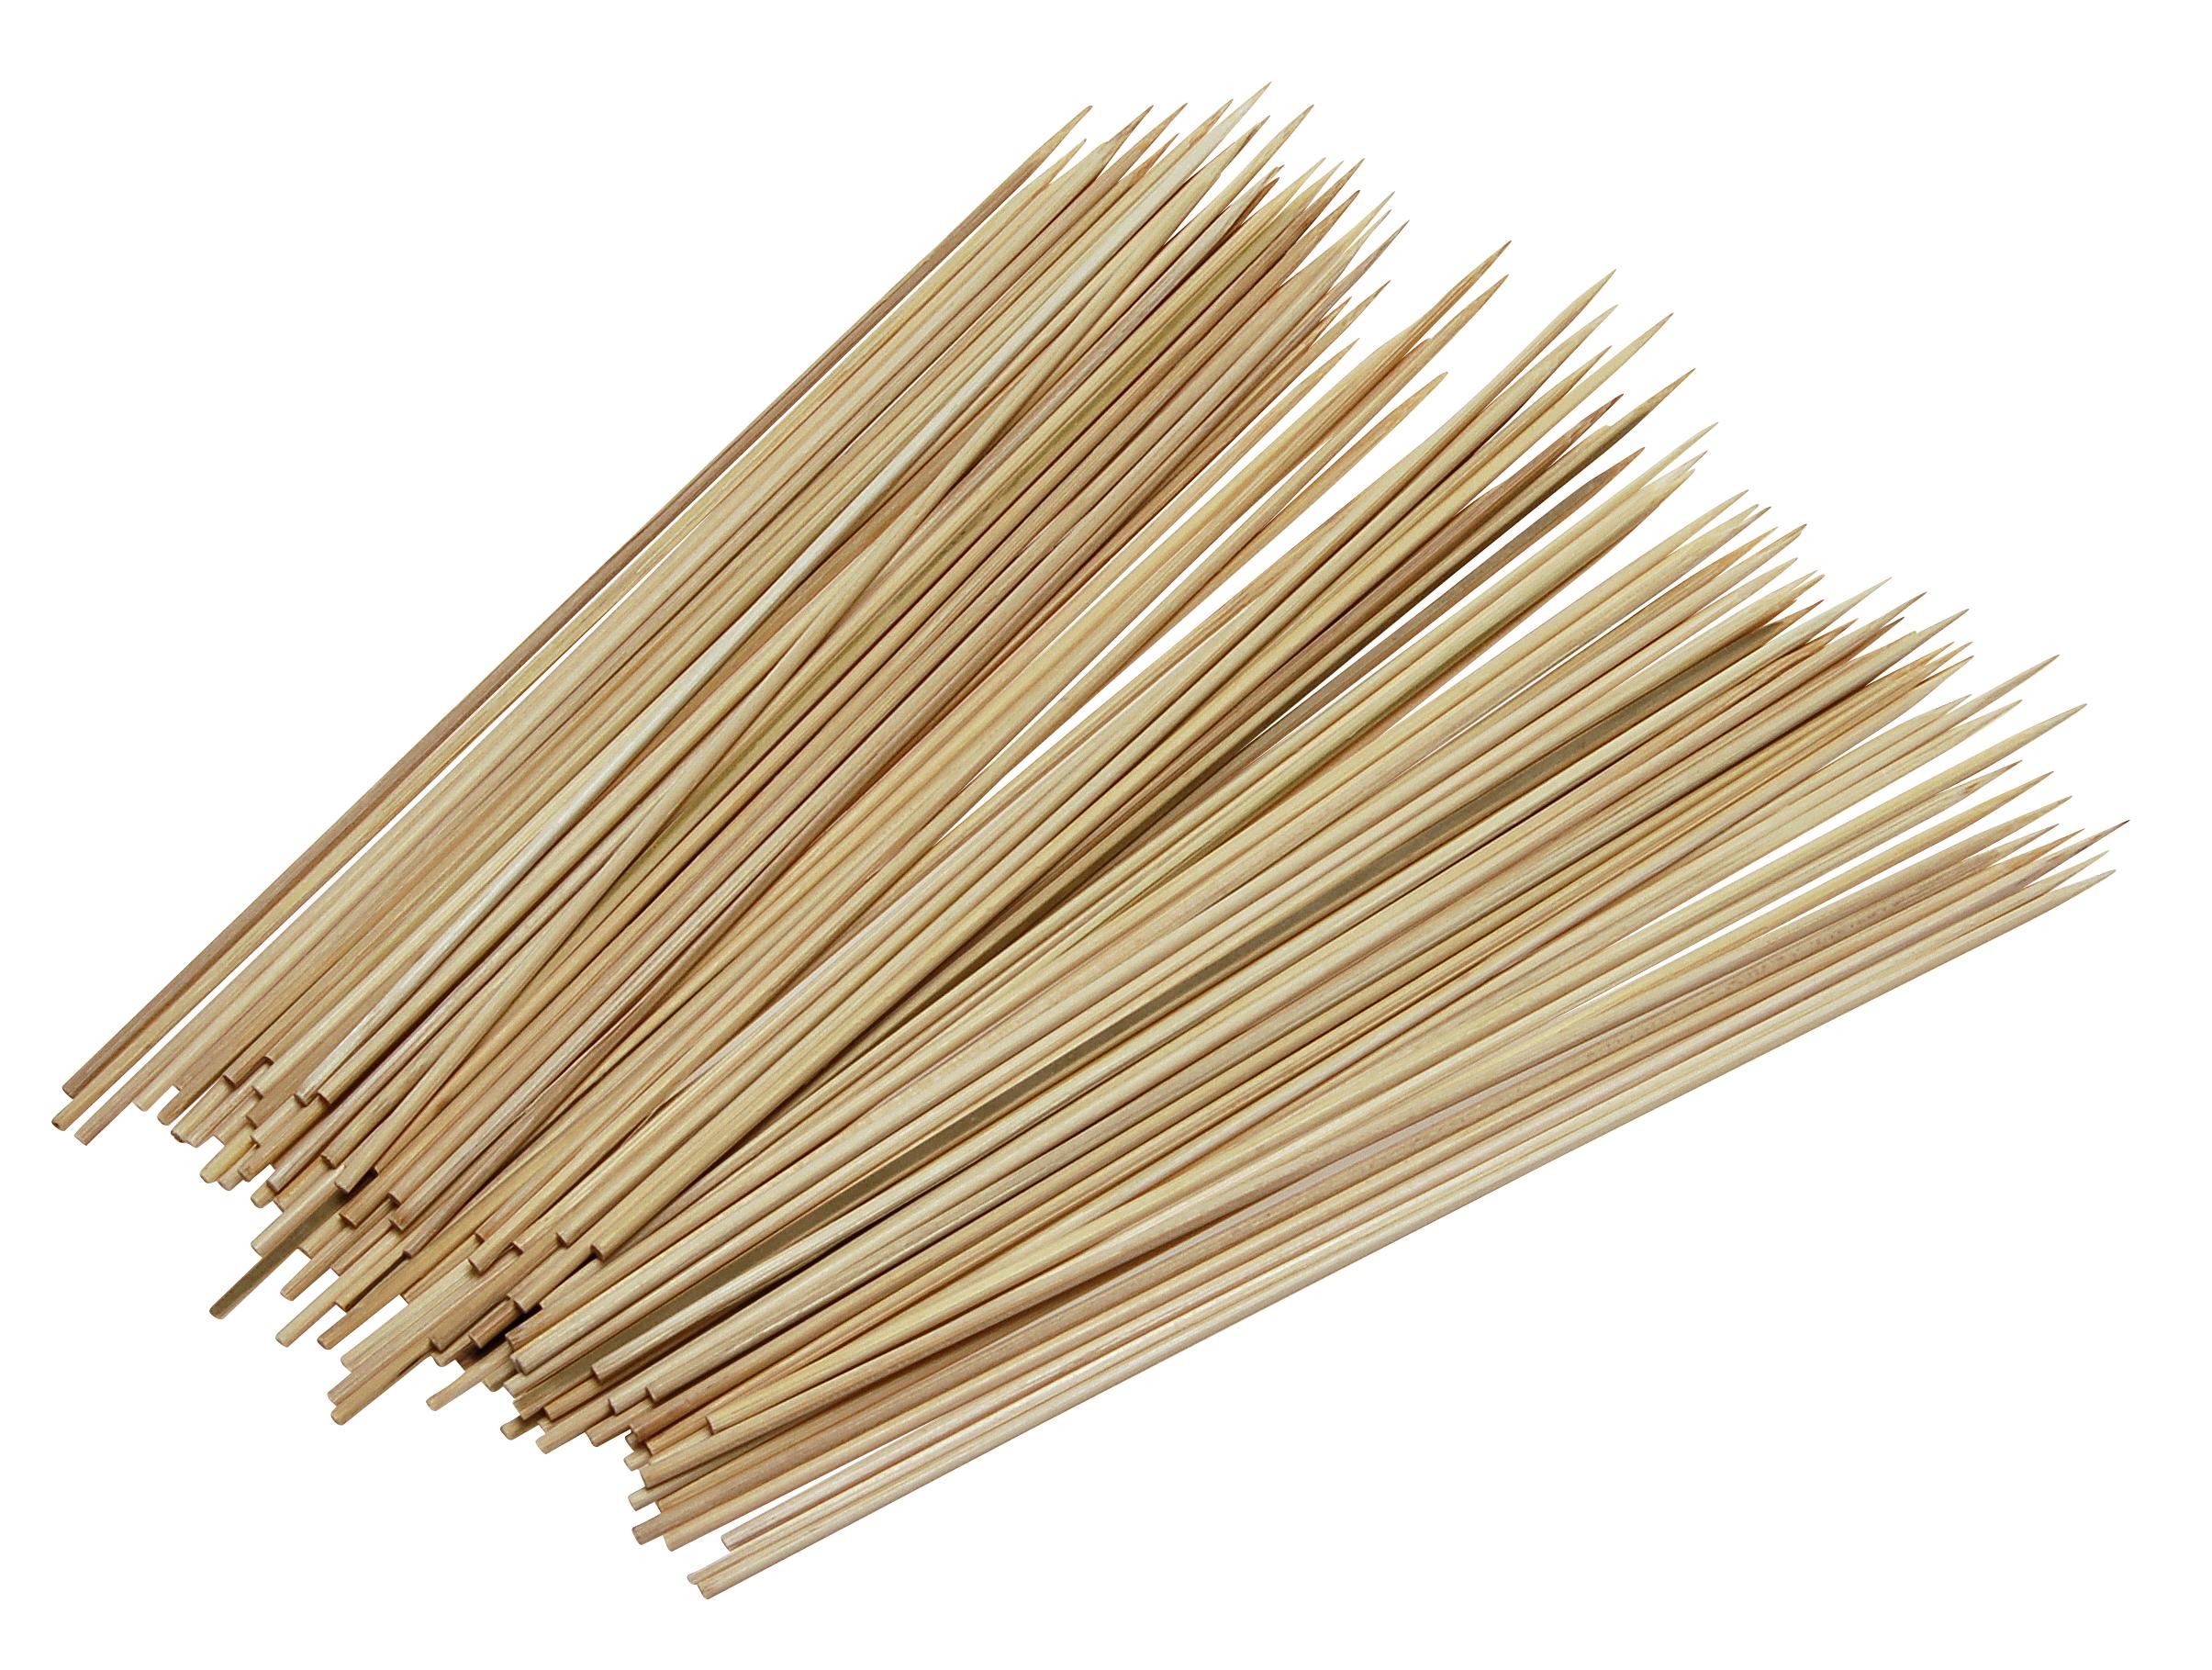 Image of   Grillspyd bambus 100 stk.